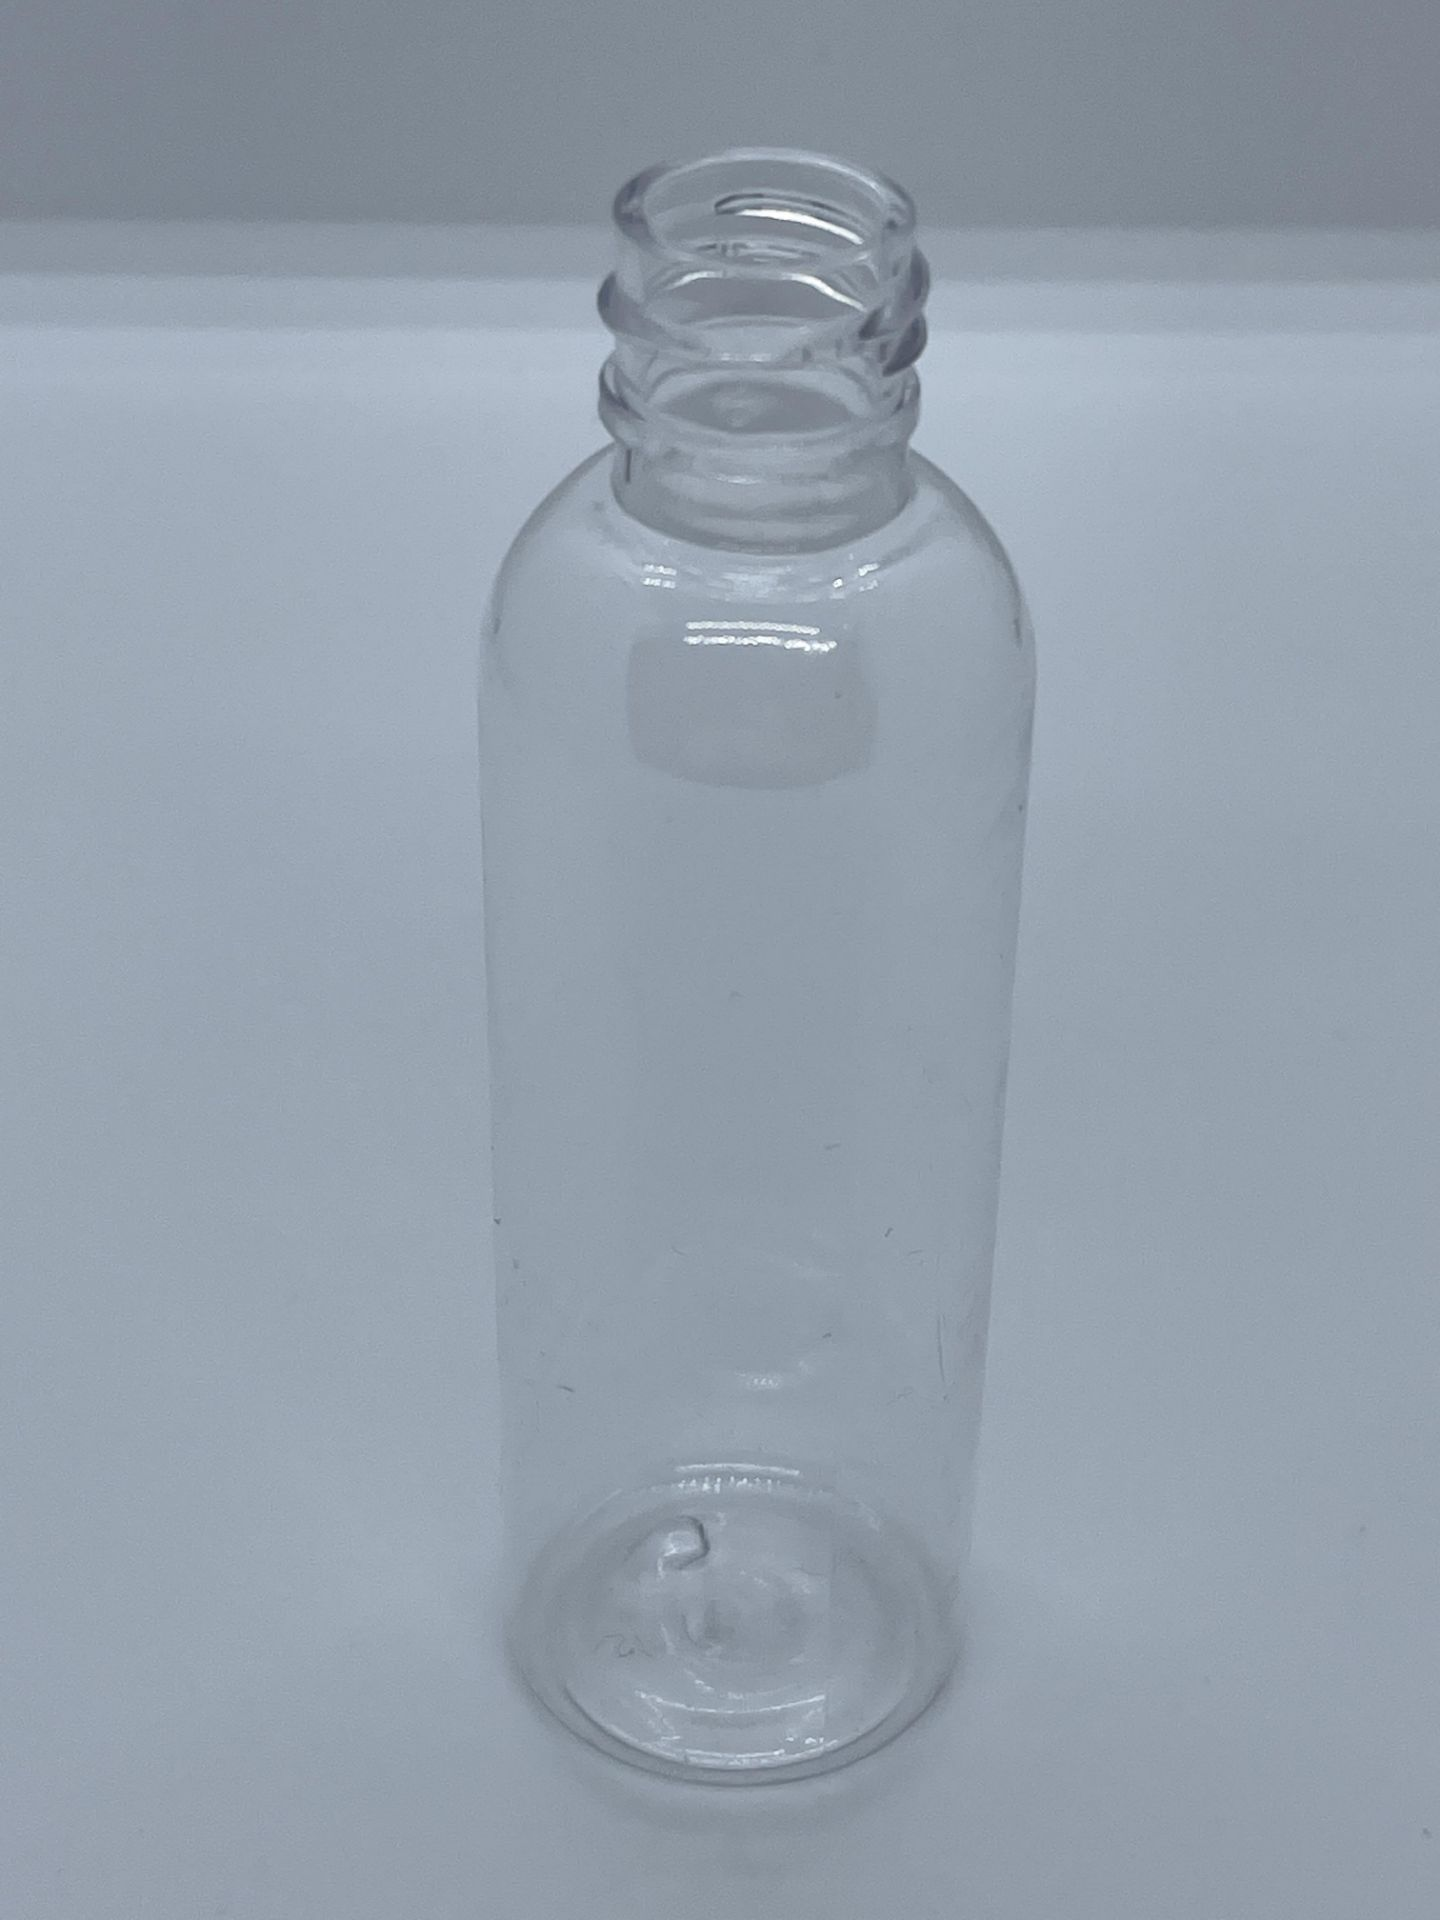 "99,500 - Clear Plastic Bullet 2 oz Empty Bottles, 18-410 Threading Neck, 4.25"" Tall 1.25"" Diameter - Image 2 of 5"